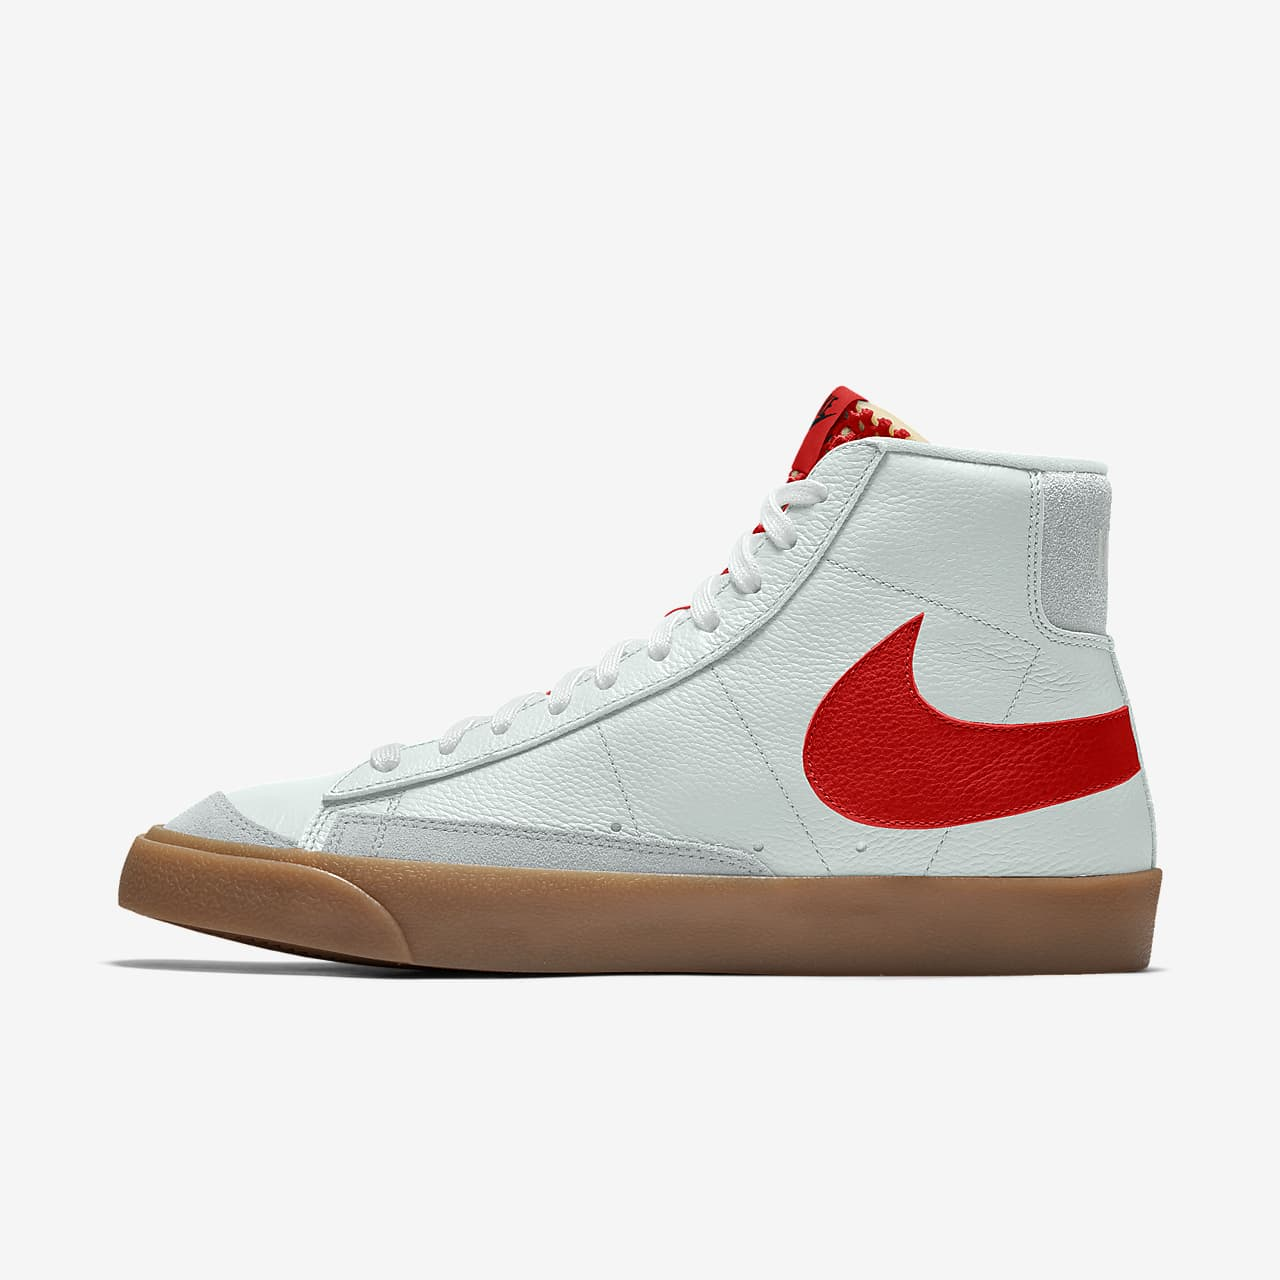 Nike Blazer 中筒 '77 Vintage By You 專屬訂製鞋款